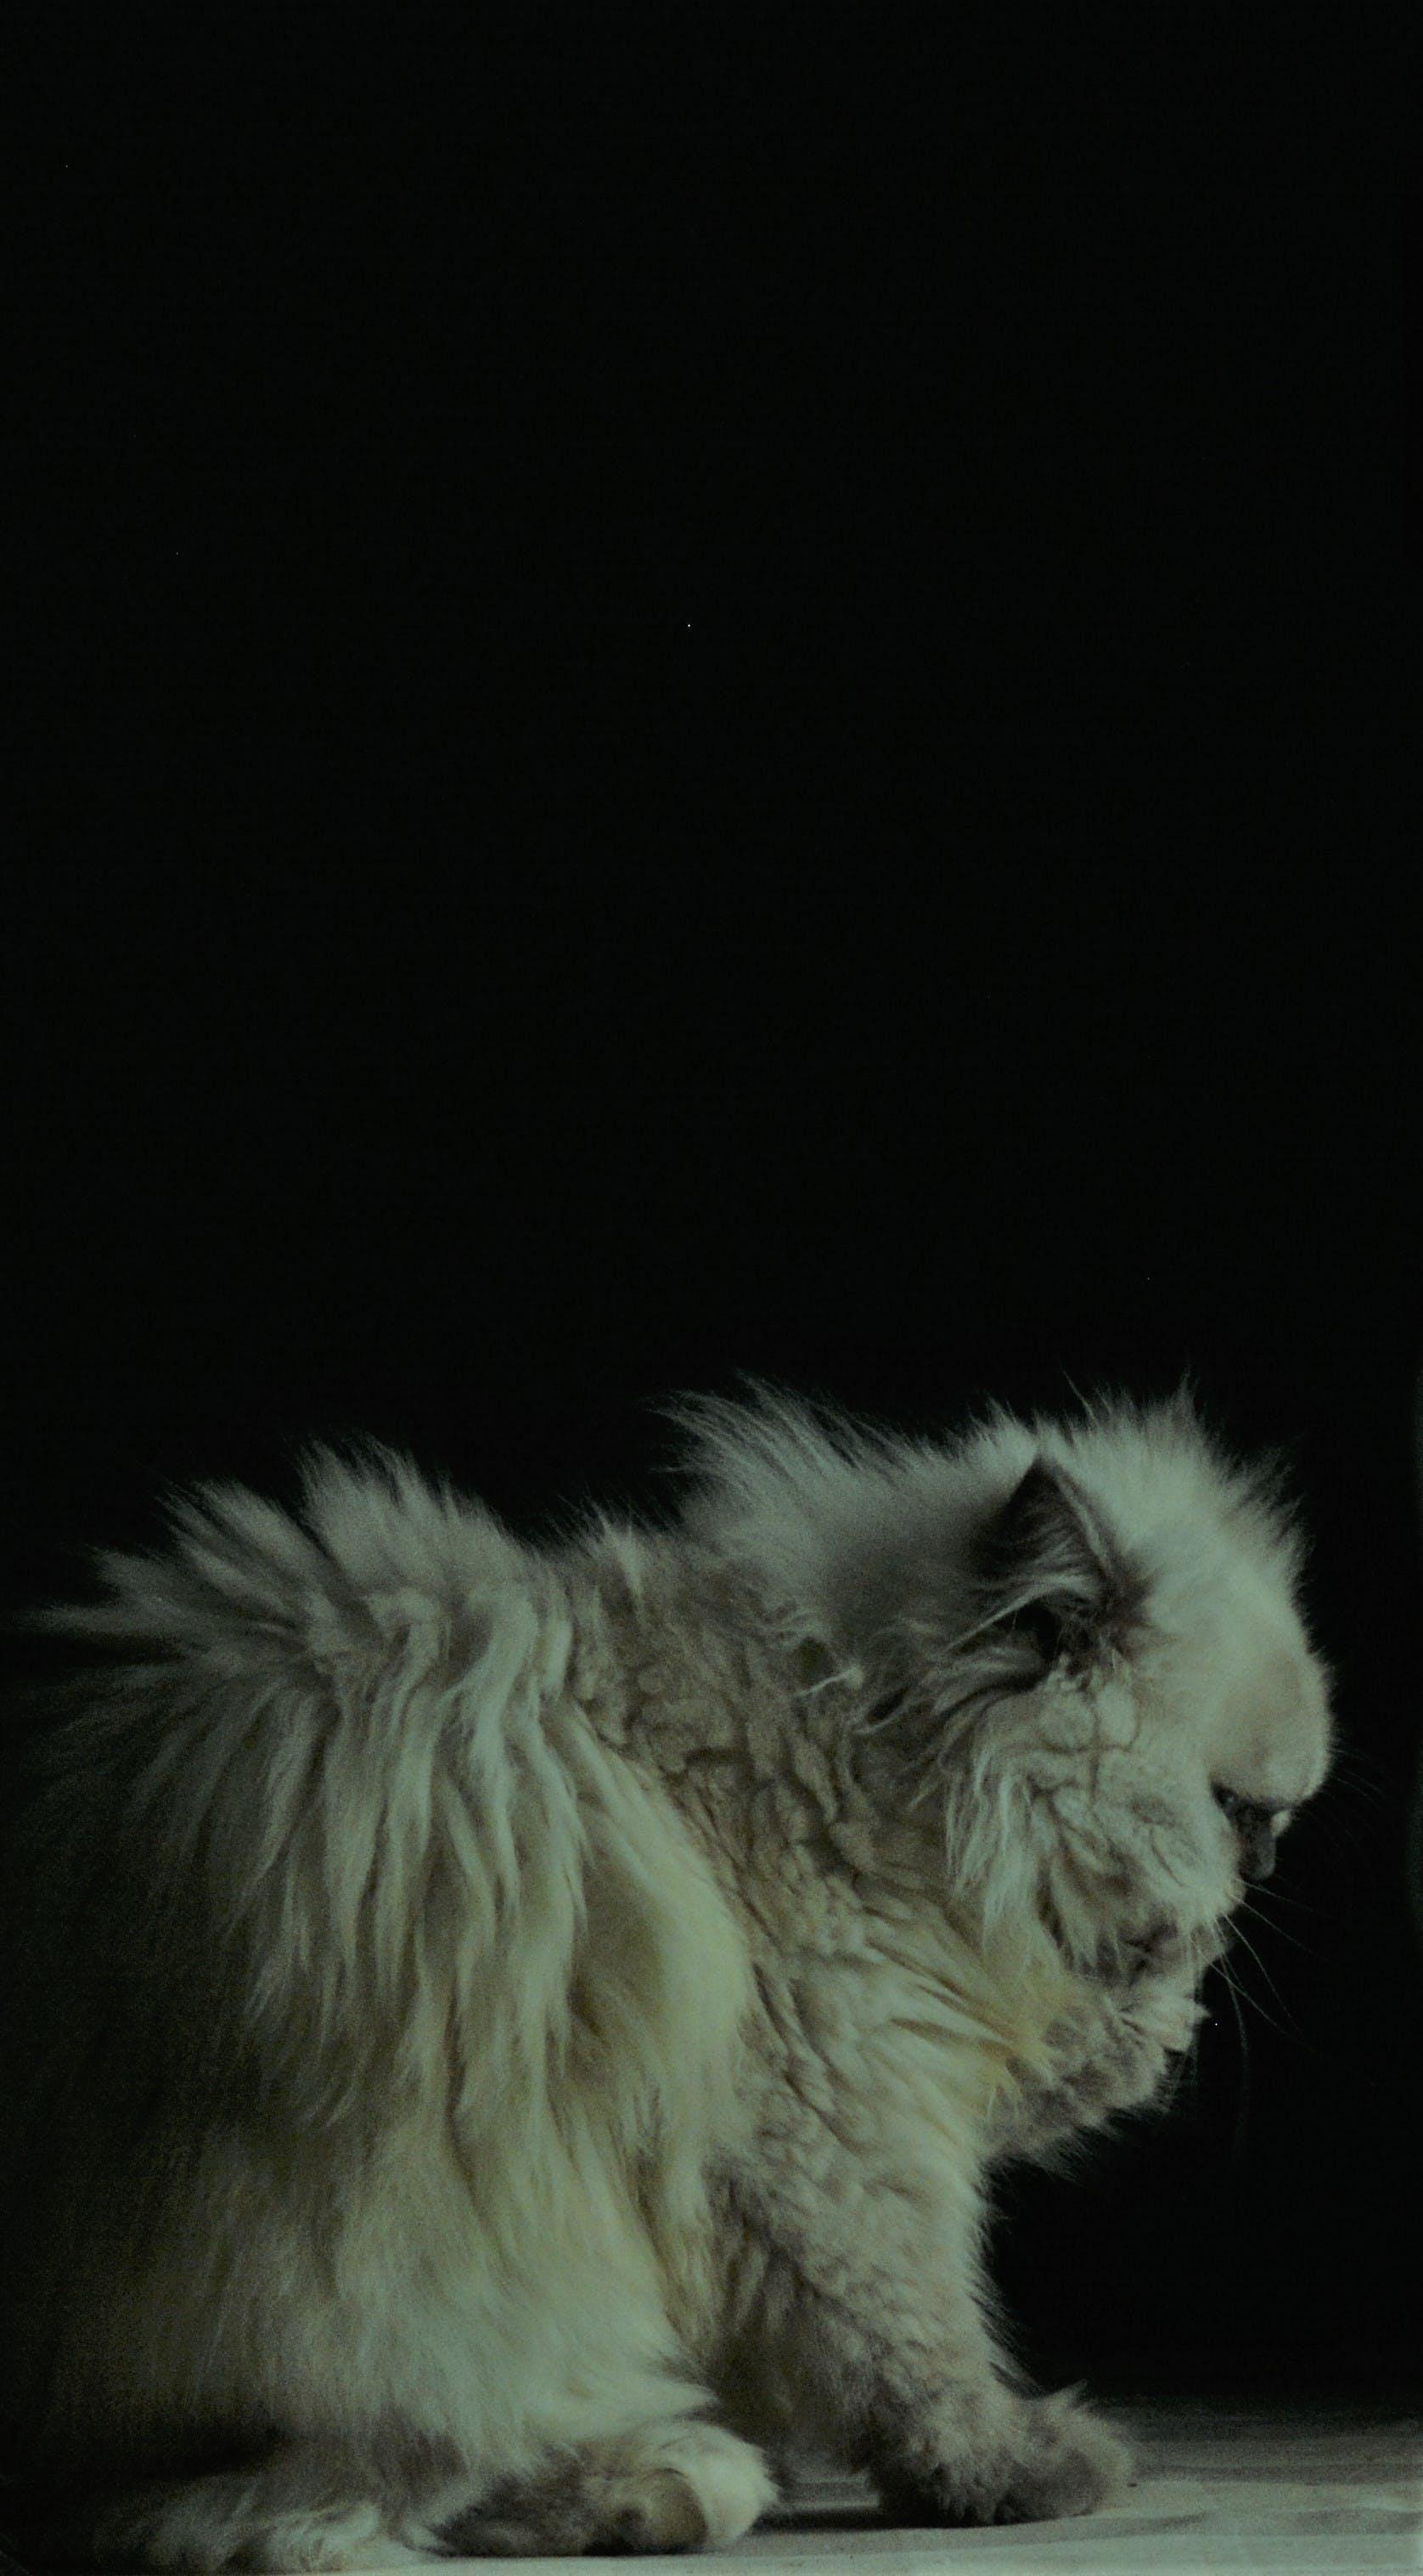 Free stock photo of background, cat, in dark